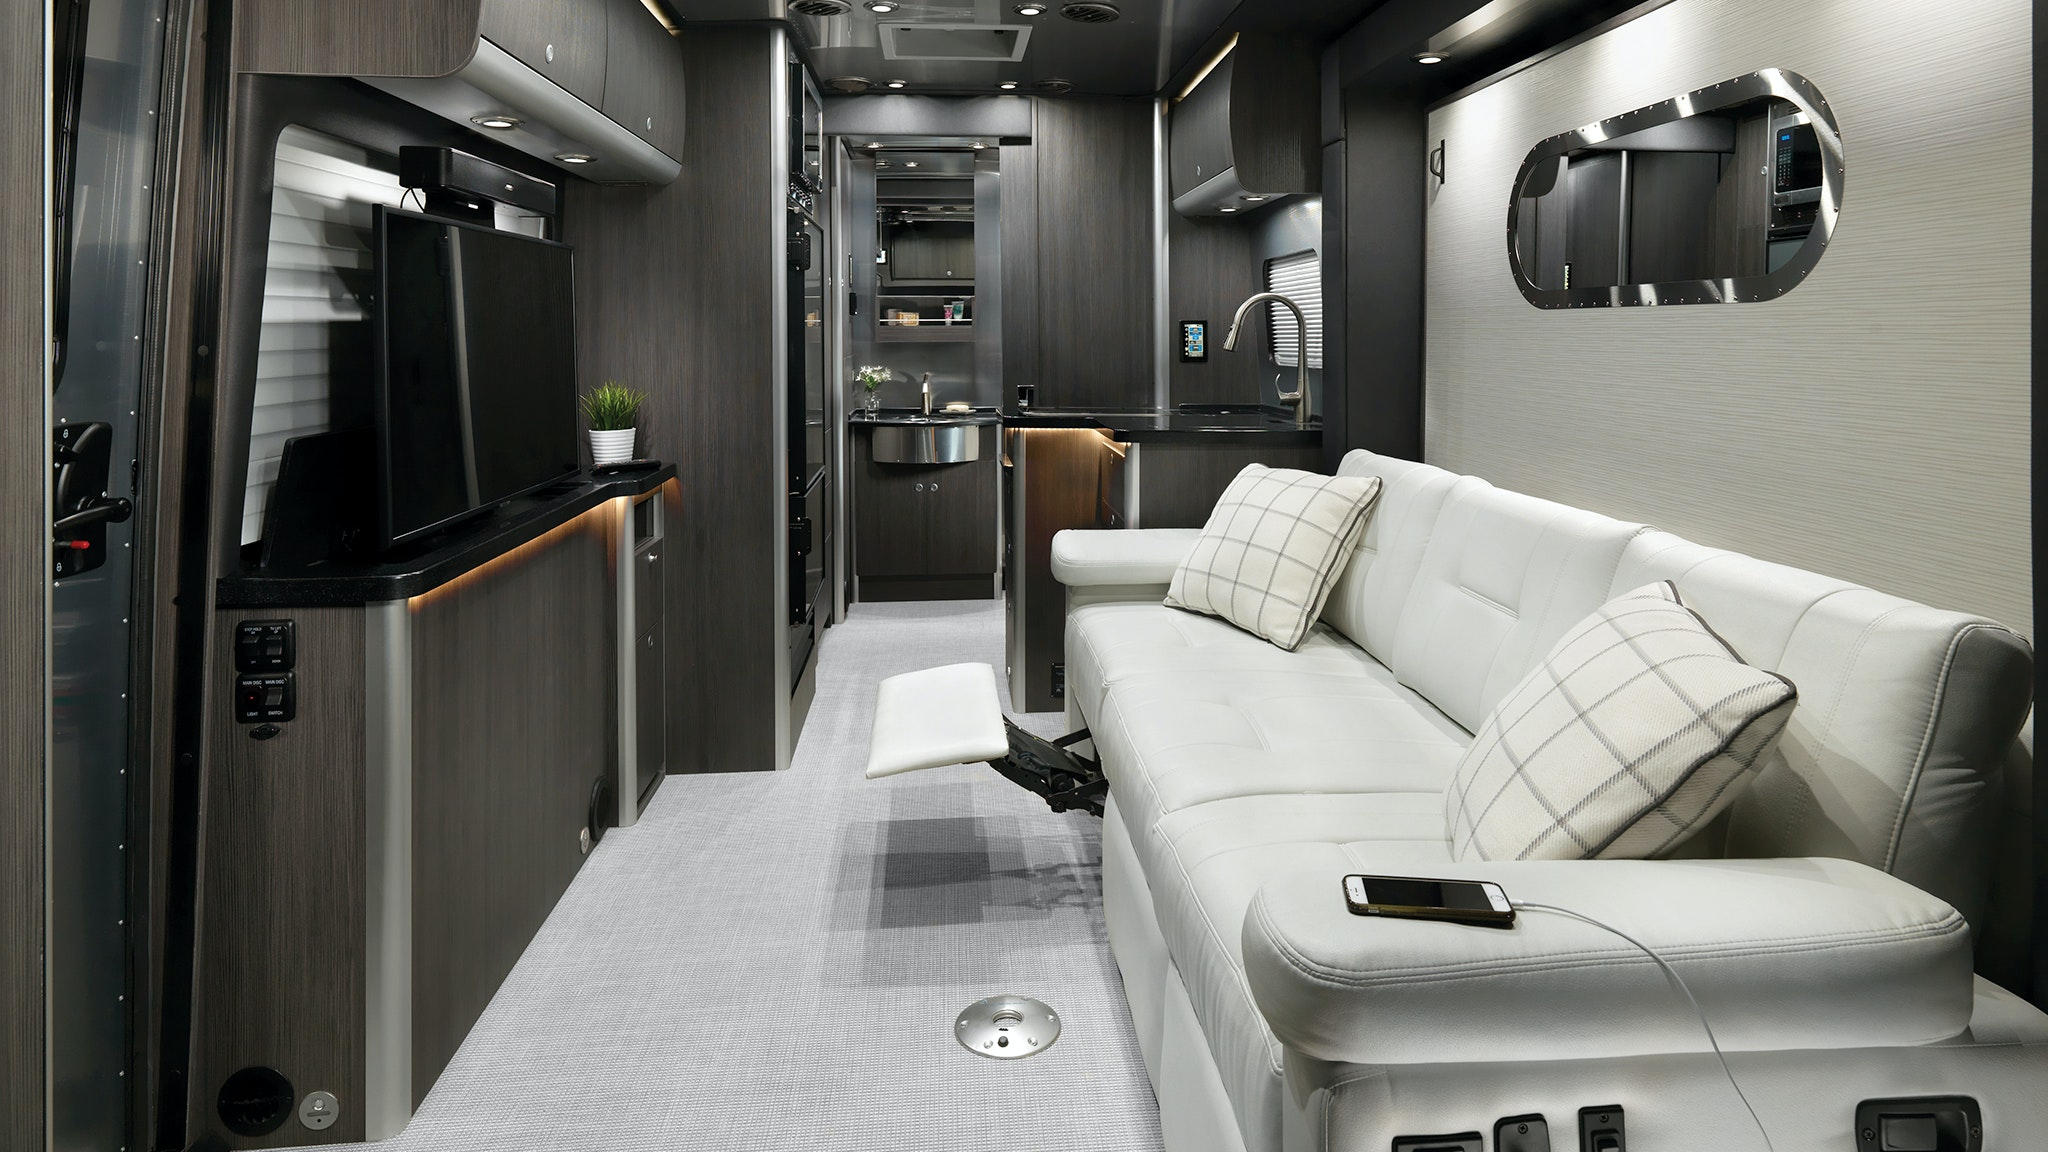 Airstream-Class-B-Touring-Coach-Luxury-RV-Header-1